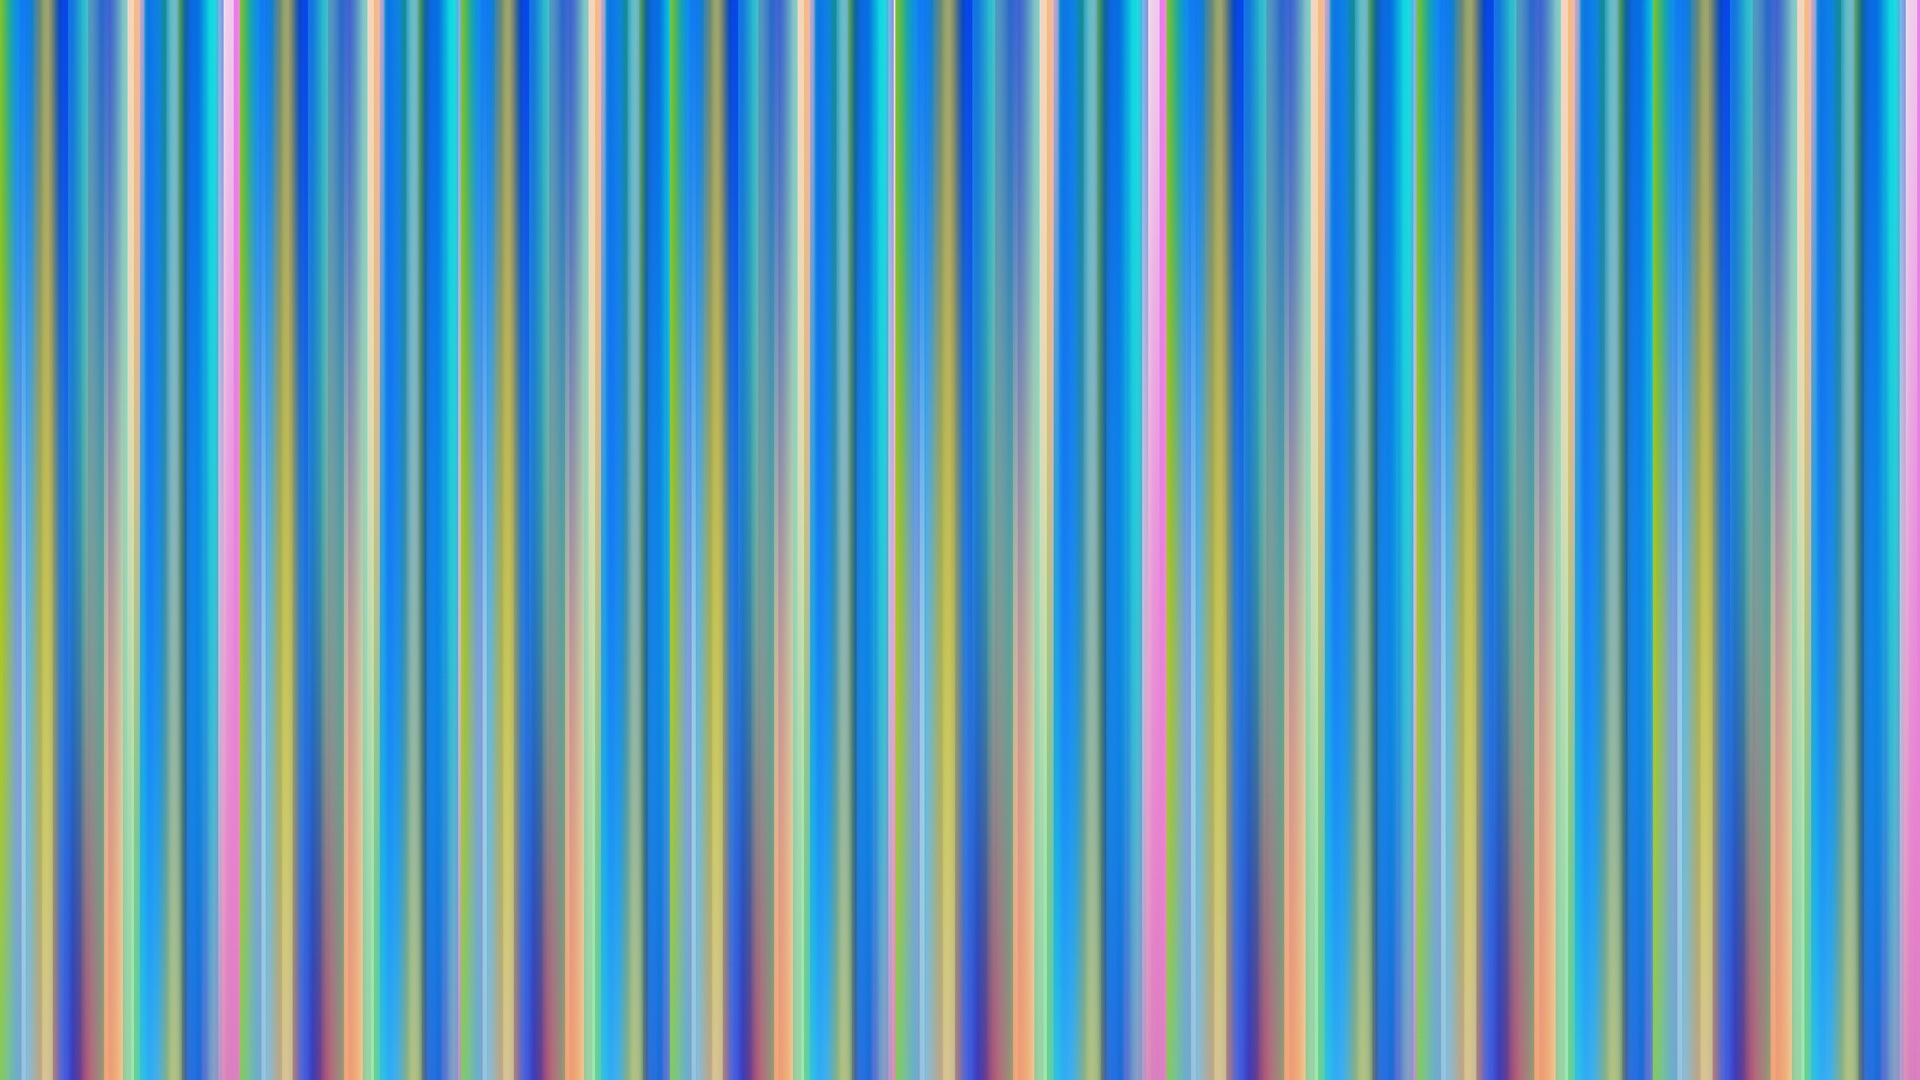 1920x1080 Colorful Aesthetics Pattern Background Laptop ...